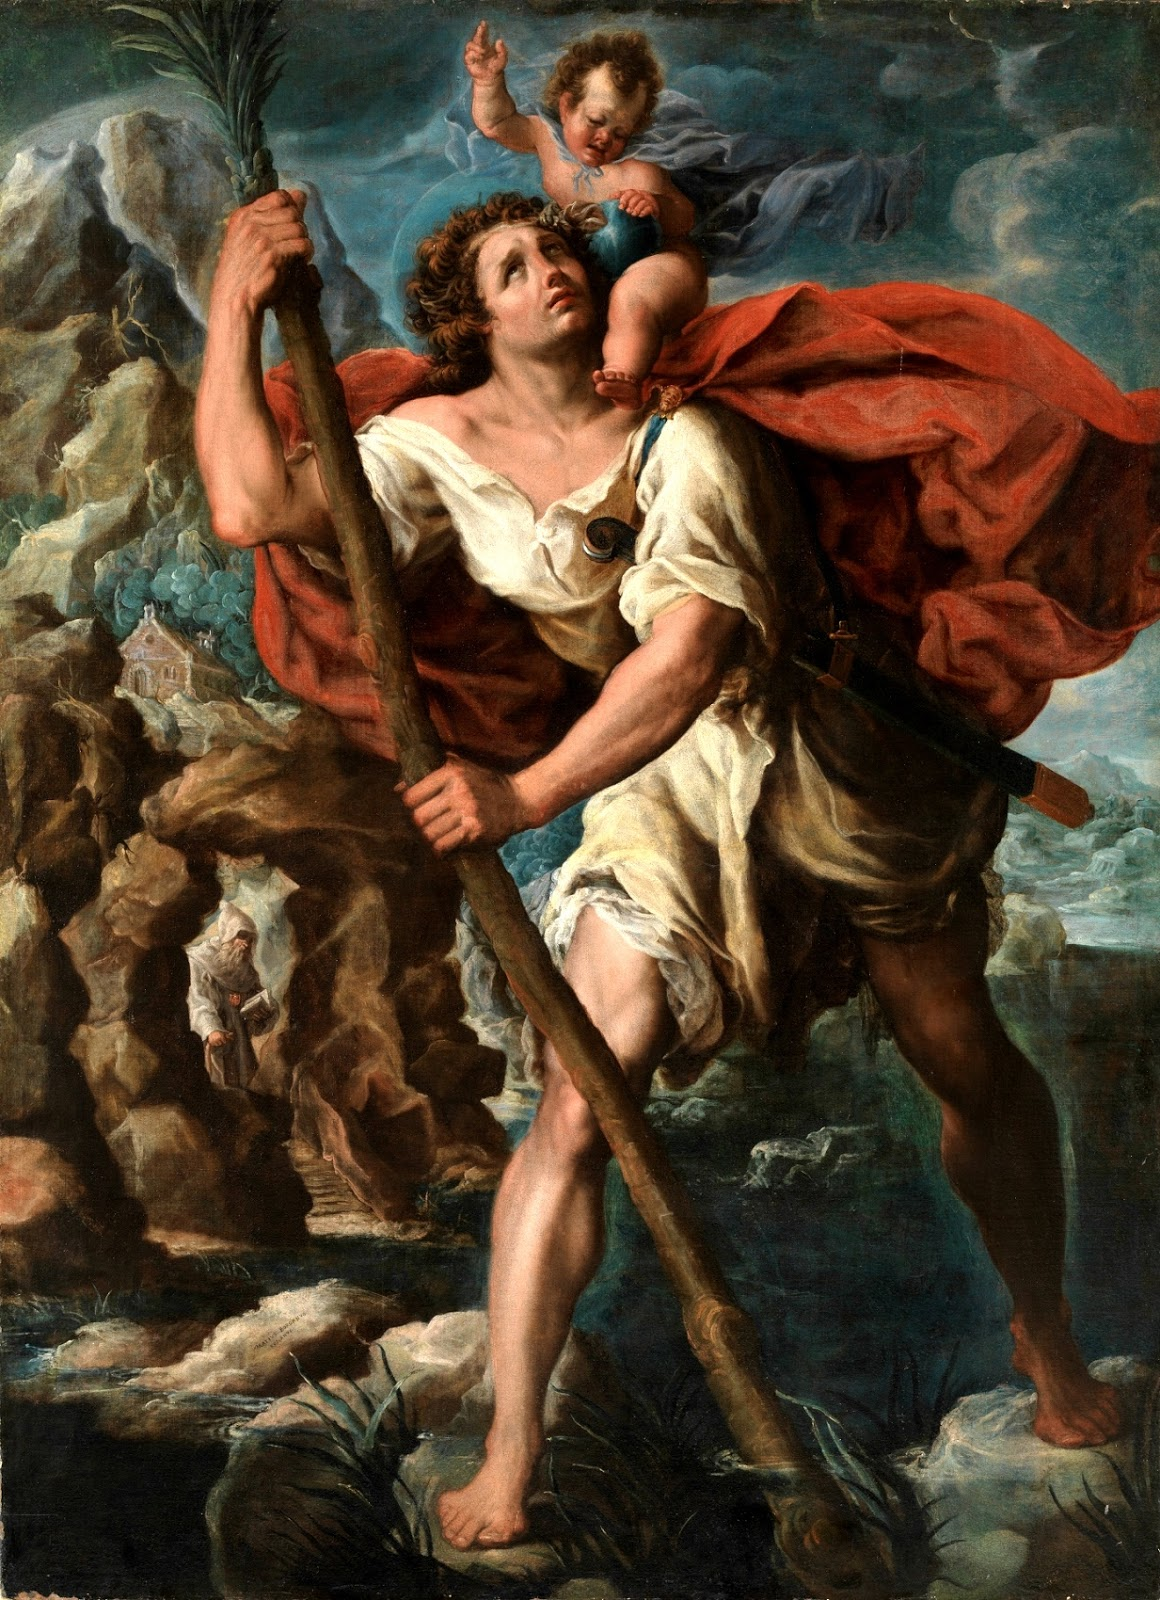 Borgianni-Orazio-St-Christopher-carrying-the-infant-Christ-c1598-1602-oil-on-canvas-Museo-del-Prado-Madrid.jpg